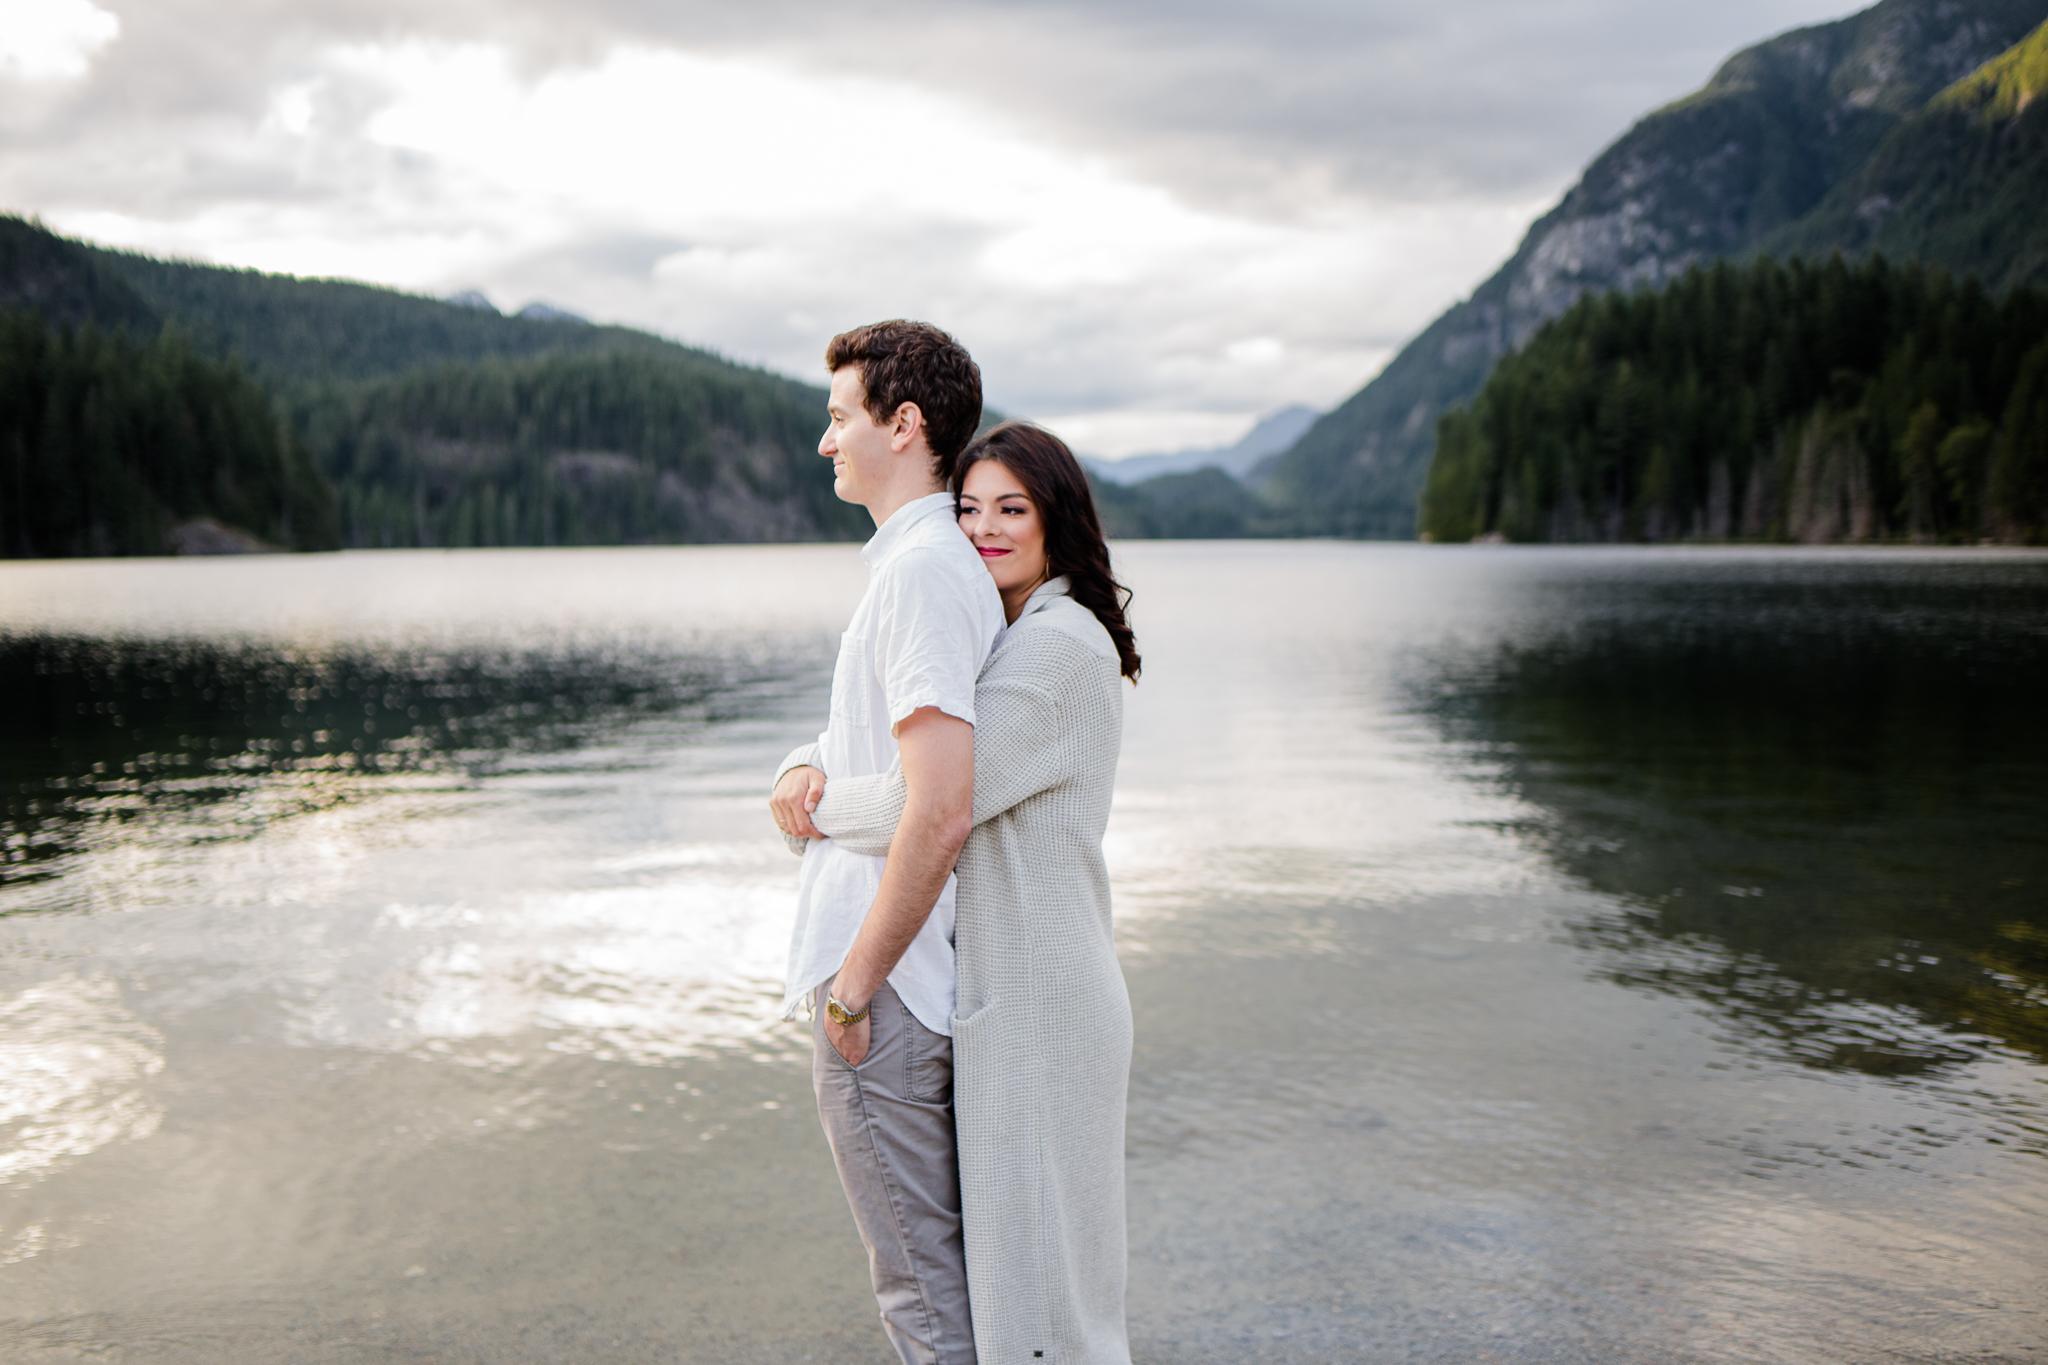 Photo of Buntzen Lake Anmore British Columbia Landscape Best Fun Engagement Photographer Port Moody Wedding Sunset Romantic Couple Photos 081.jpg